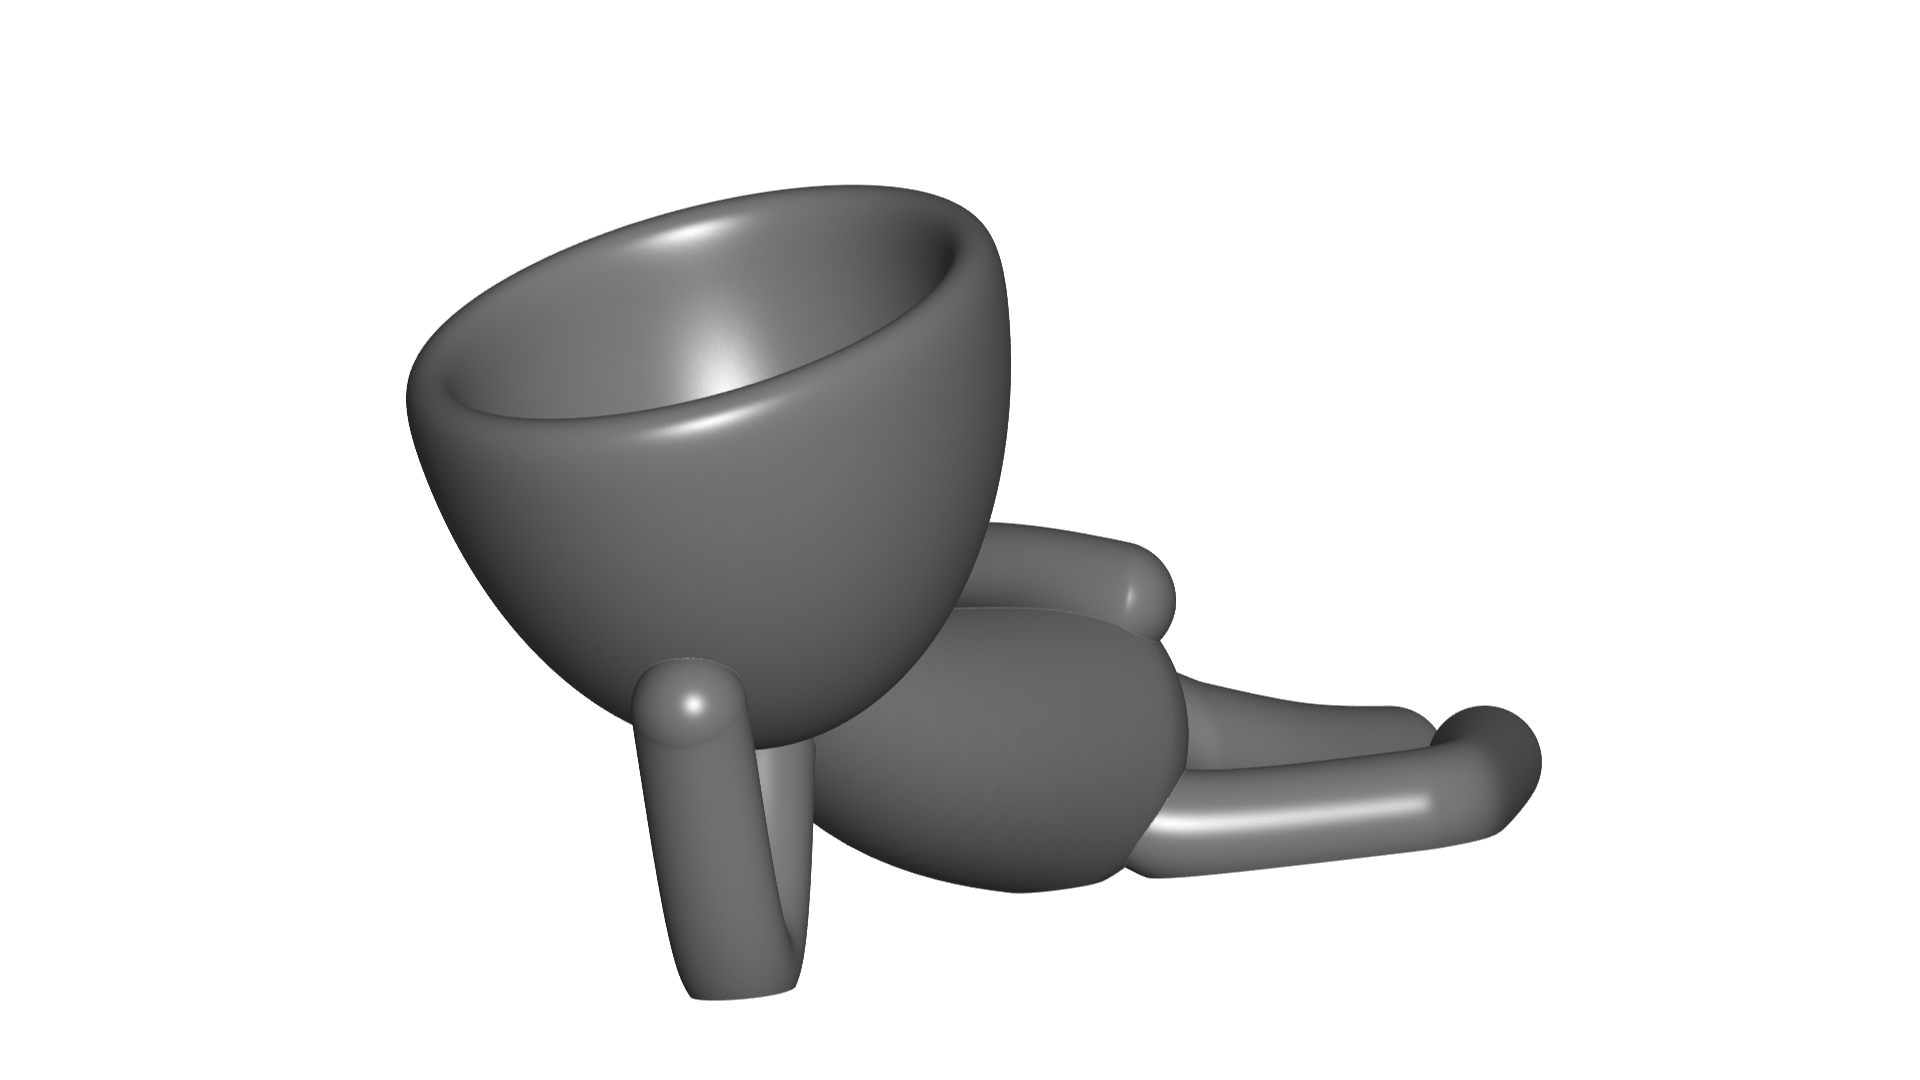 Vaso_10_Gris_1.jpg Download free STL file JARRÓN MACETA ROBERT 10 - VASE FLOWERPOT ROBERT 10 • 3D printable object, PRODUSTL56